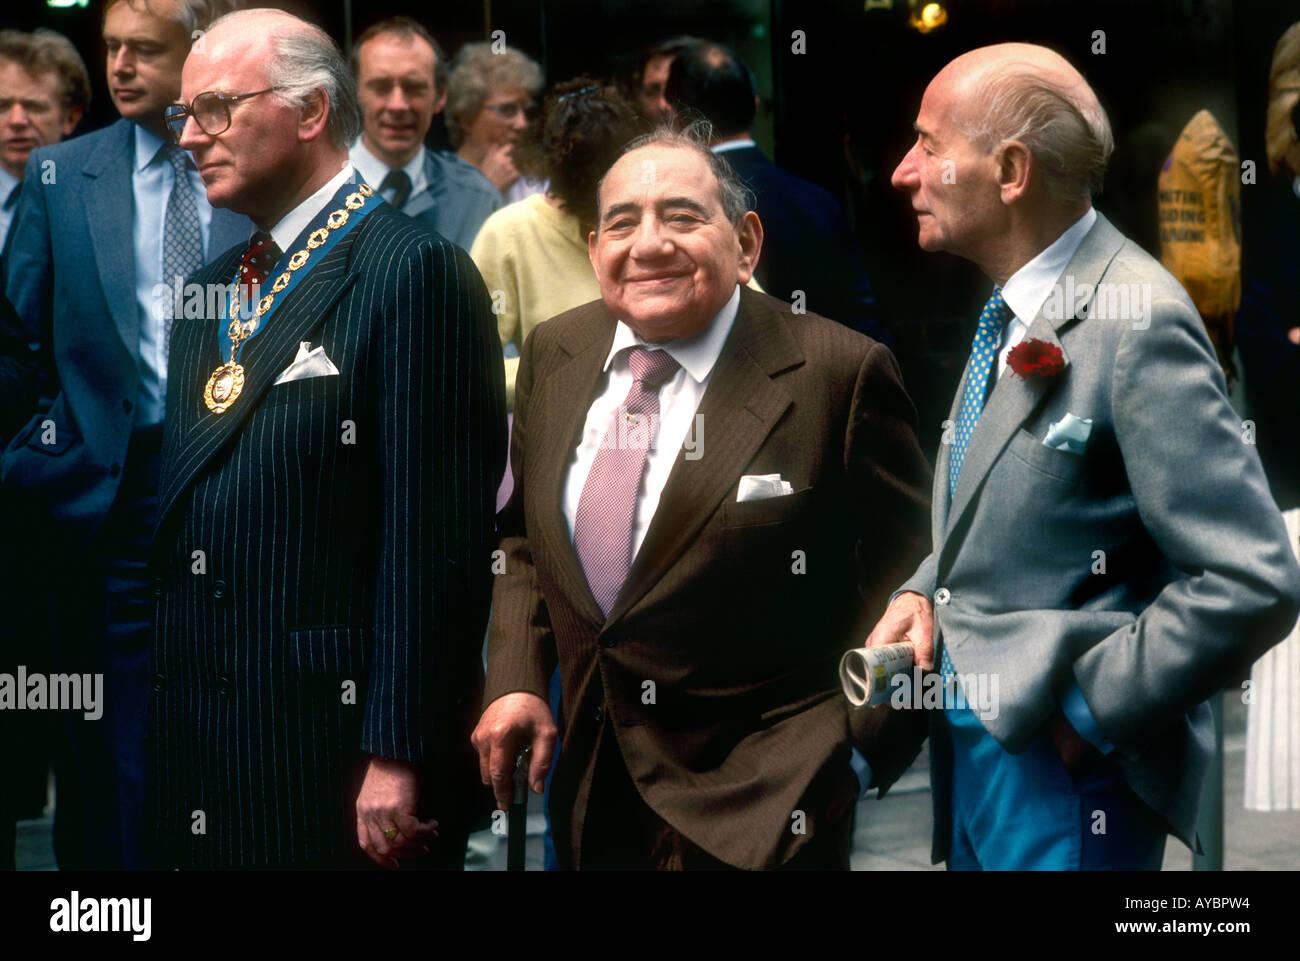 Robert Bright With Harry Helman And Bobby Valentine, Bespoke Savile Row  Tailors At Savile Row